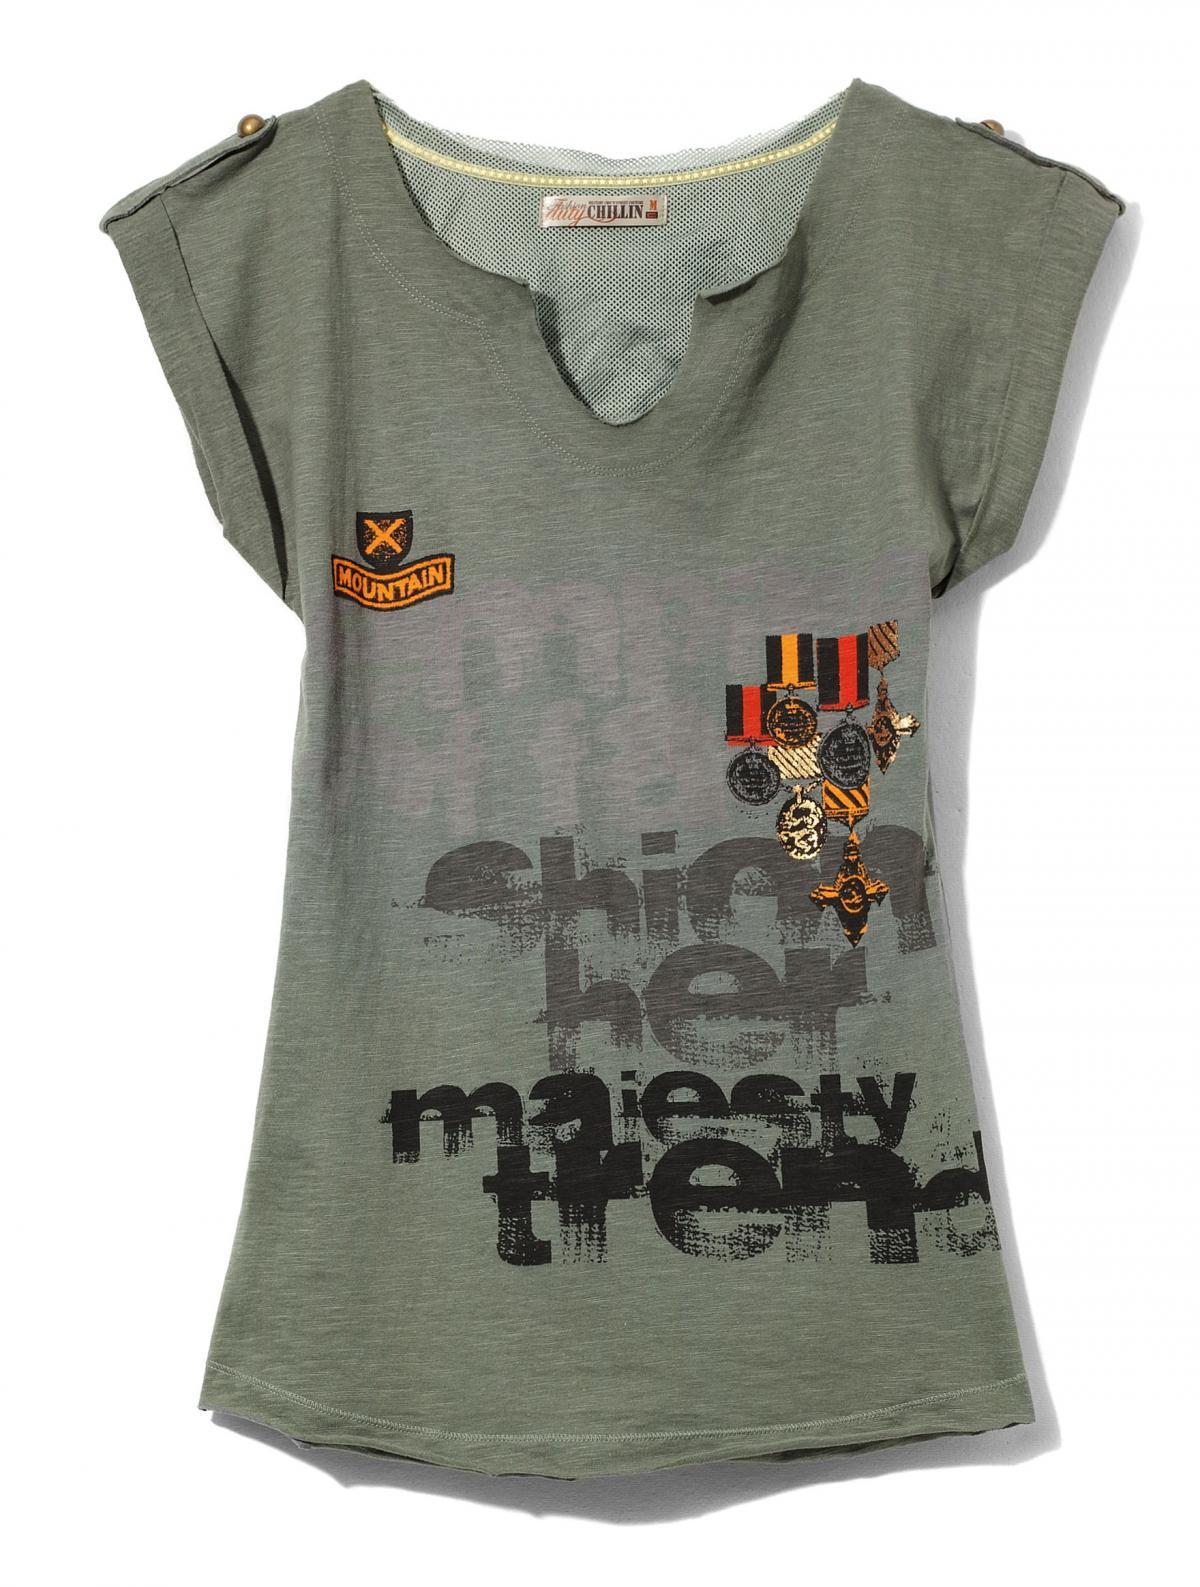 popielaty t-shirt Cropp - wiosna 2011